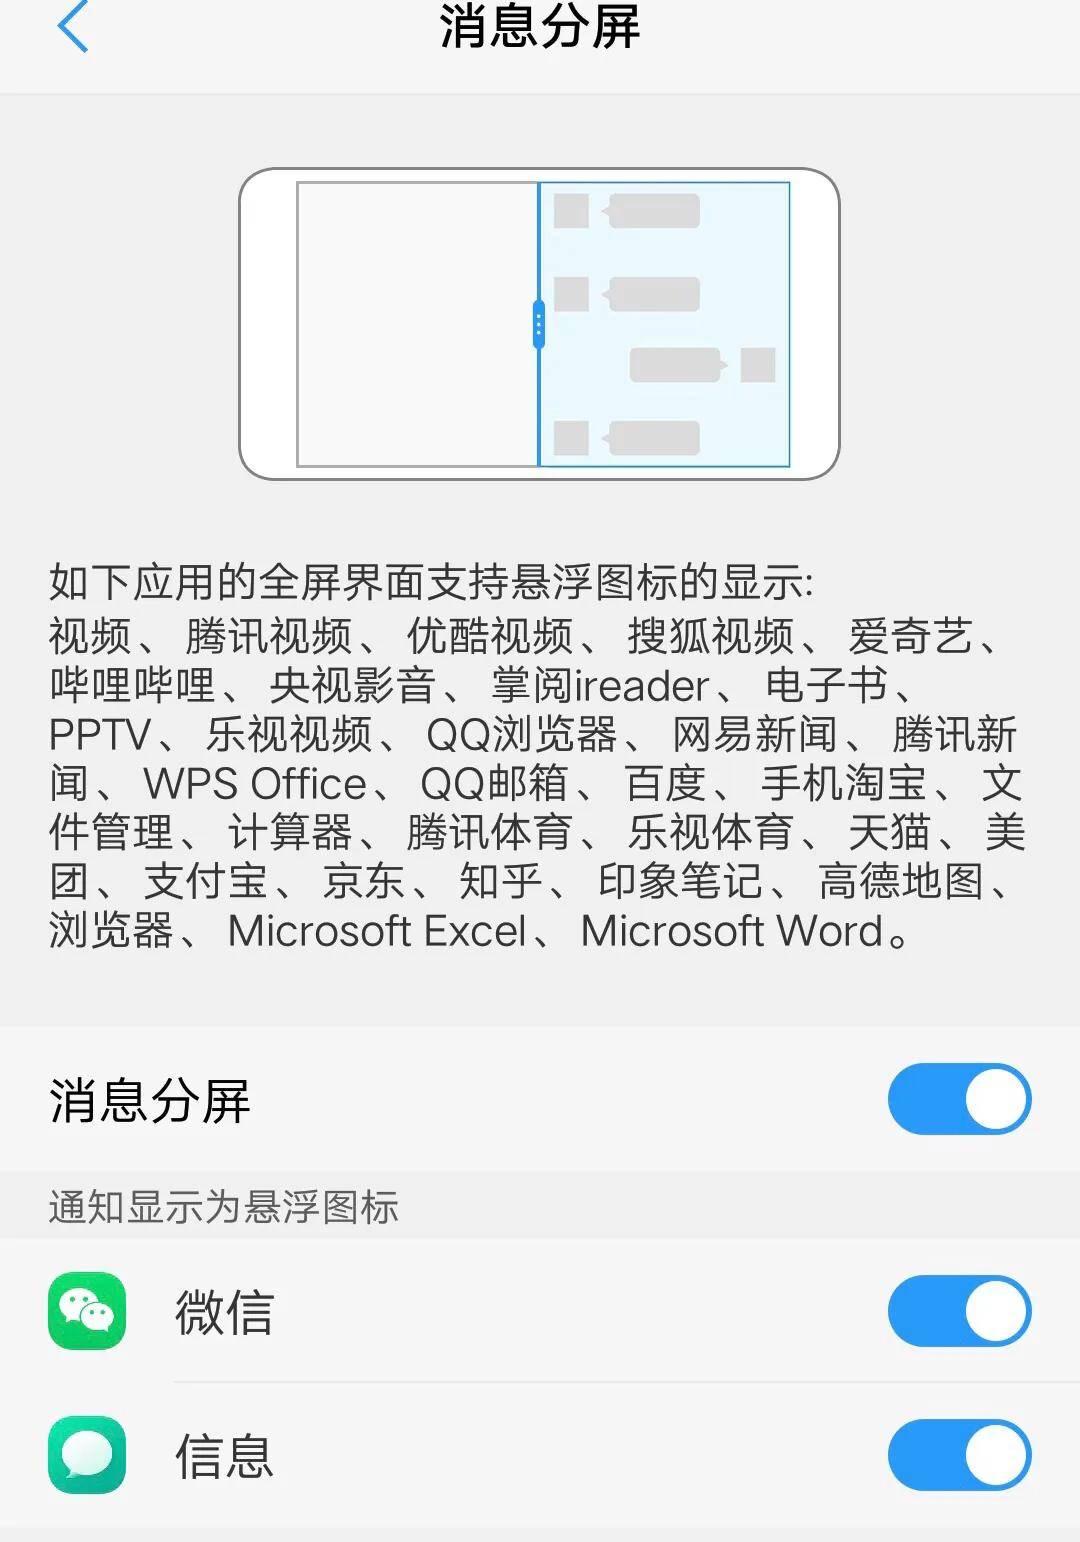 vivoy66怎么分屏(vivo分屏模式怎么开启)插图(2)